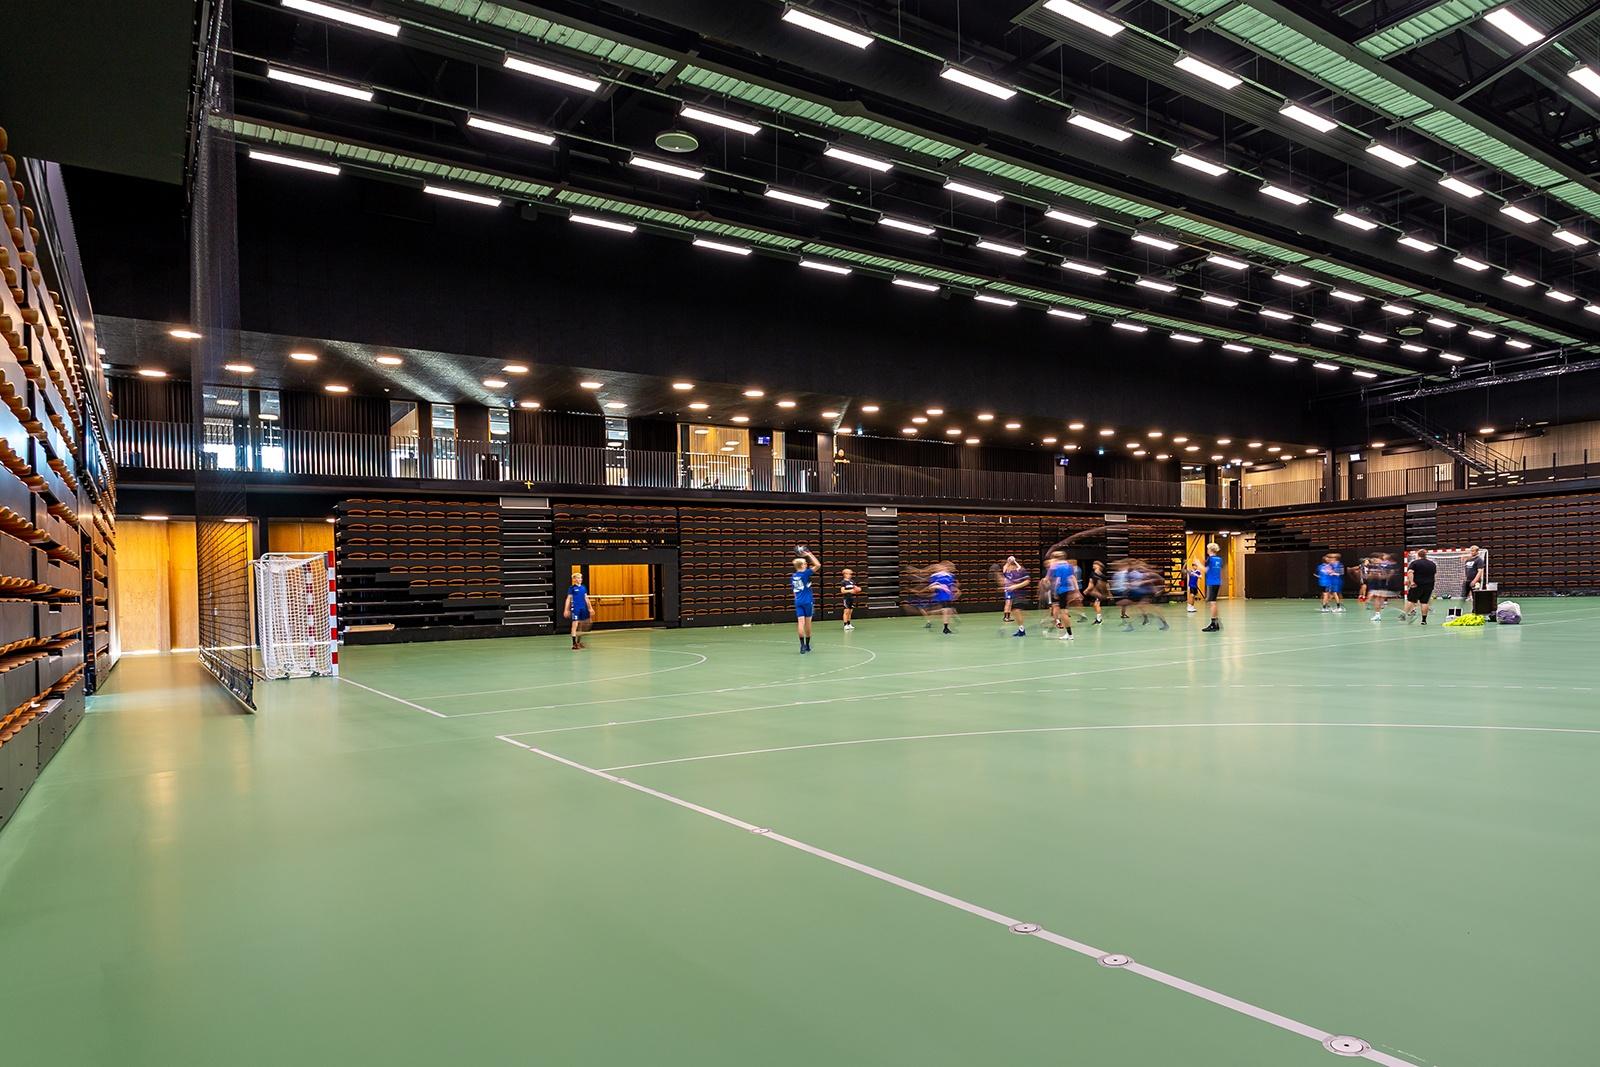 Arena Randers_LINK arkitektur_Fotograf Thomas Illemann_300dpi_15_1600